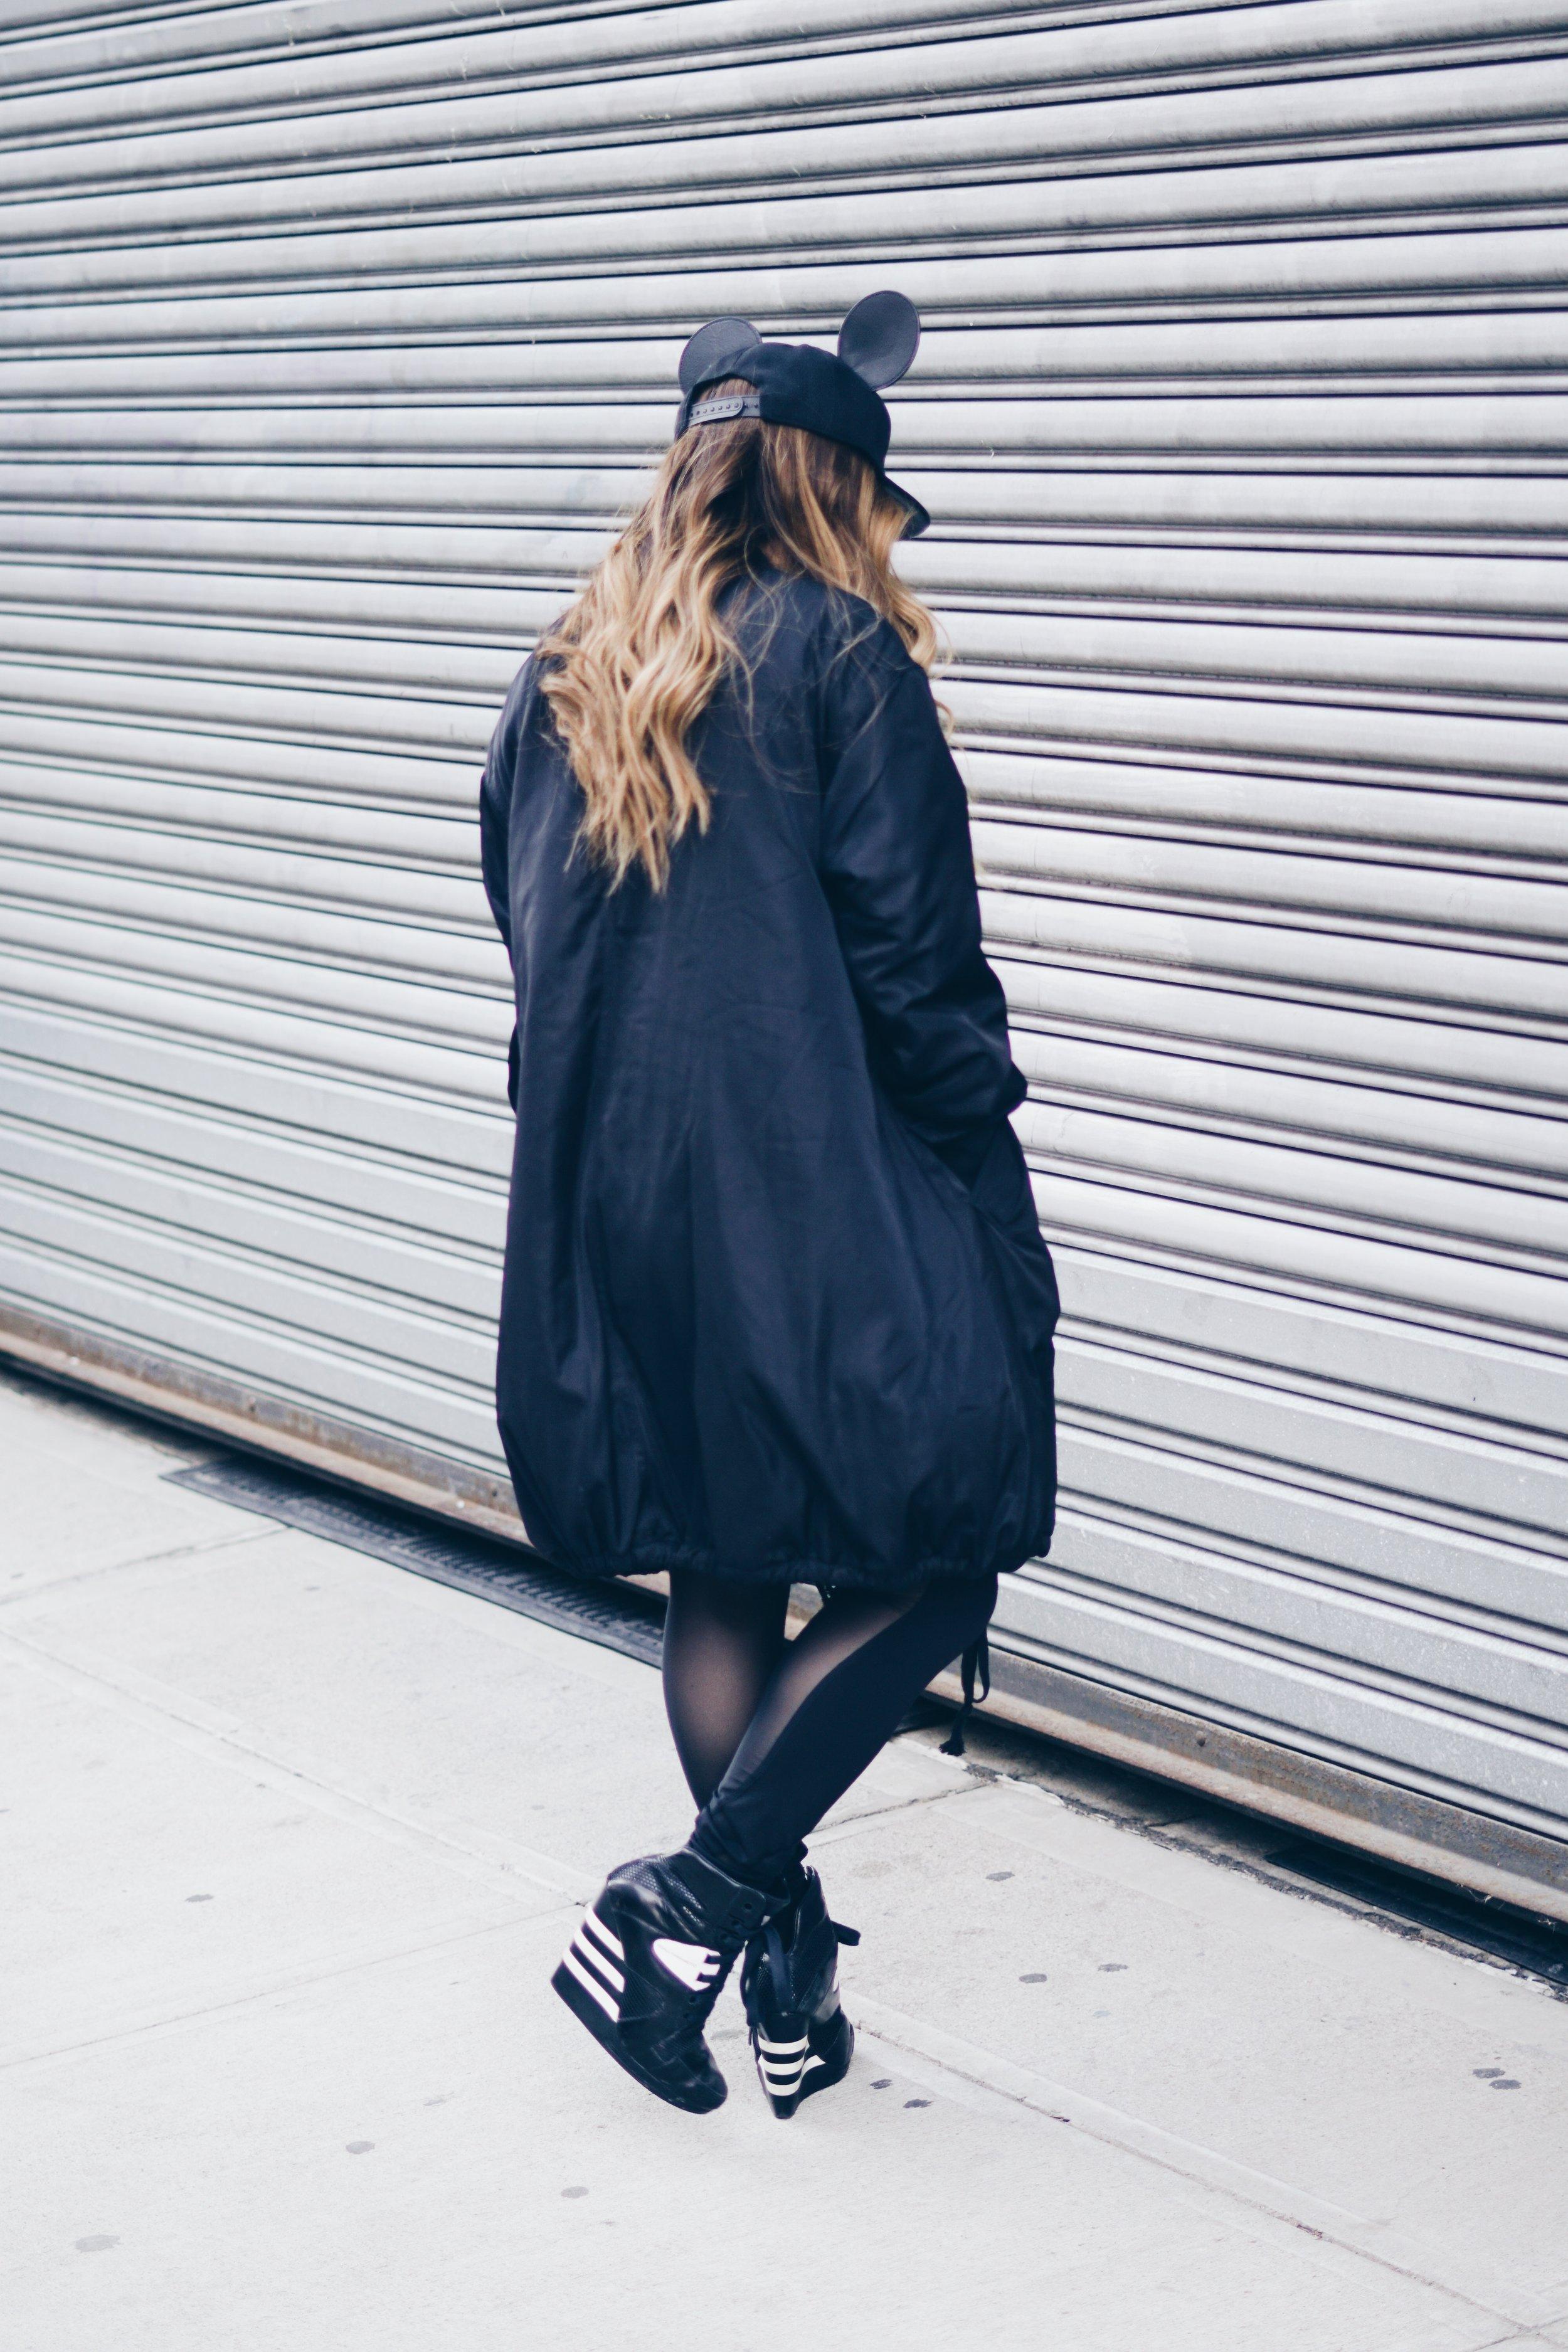 Jacket: Tobi |Top:  Alala  | Leggings:  lululemon  | Shoes: Y-3 | Hat: H&M